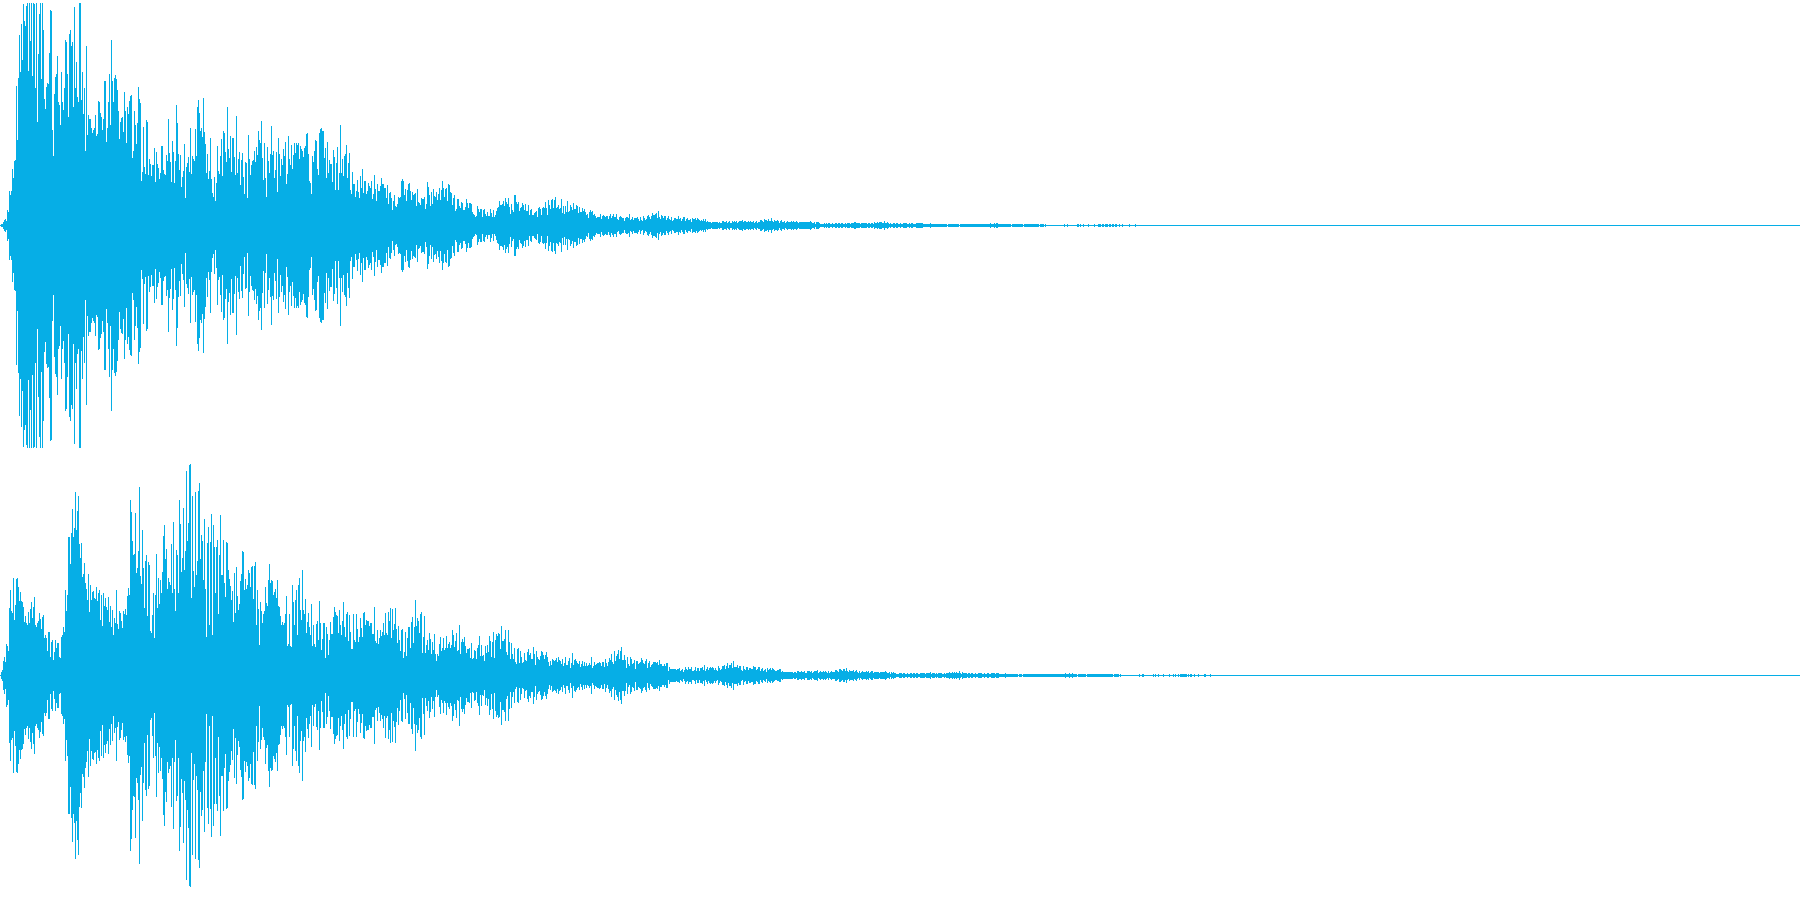 Mononoke もののけ 妖怪 悪戯の再生済みの波形